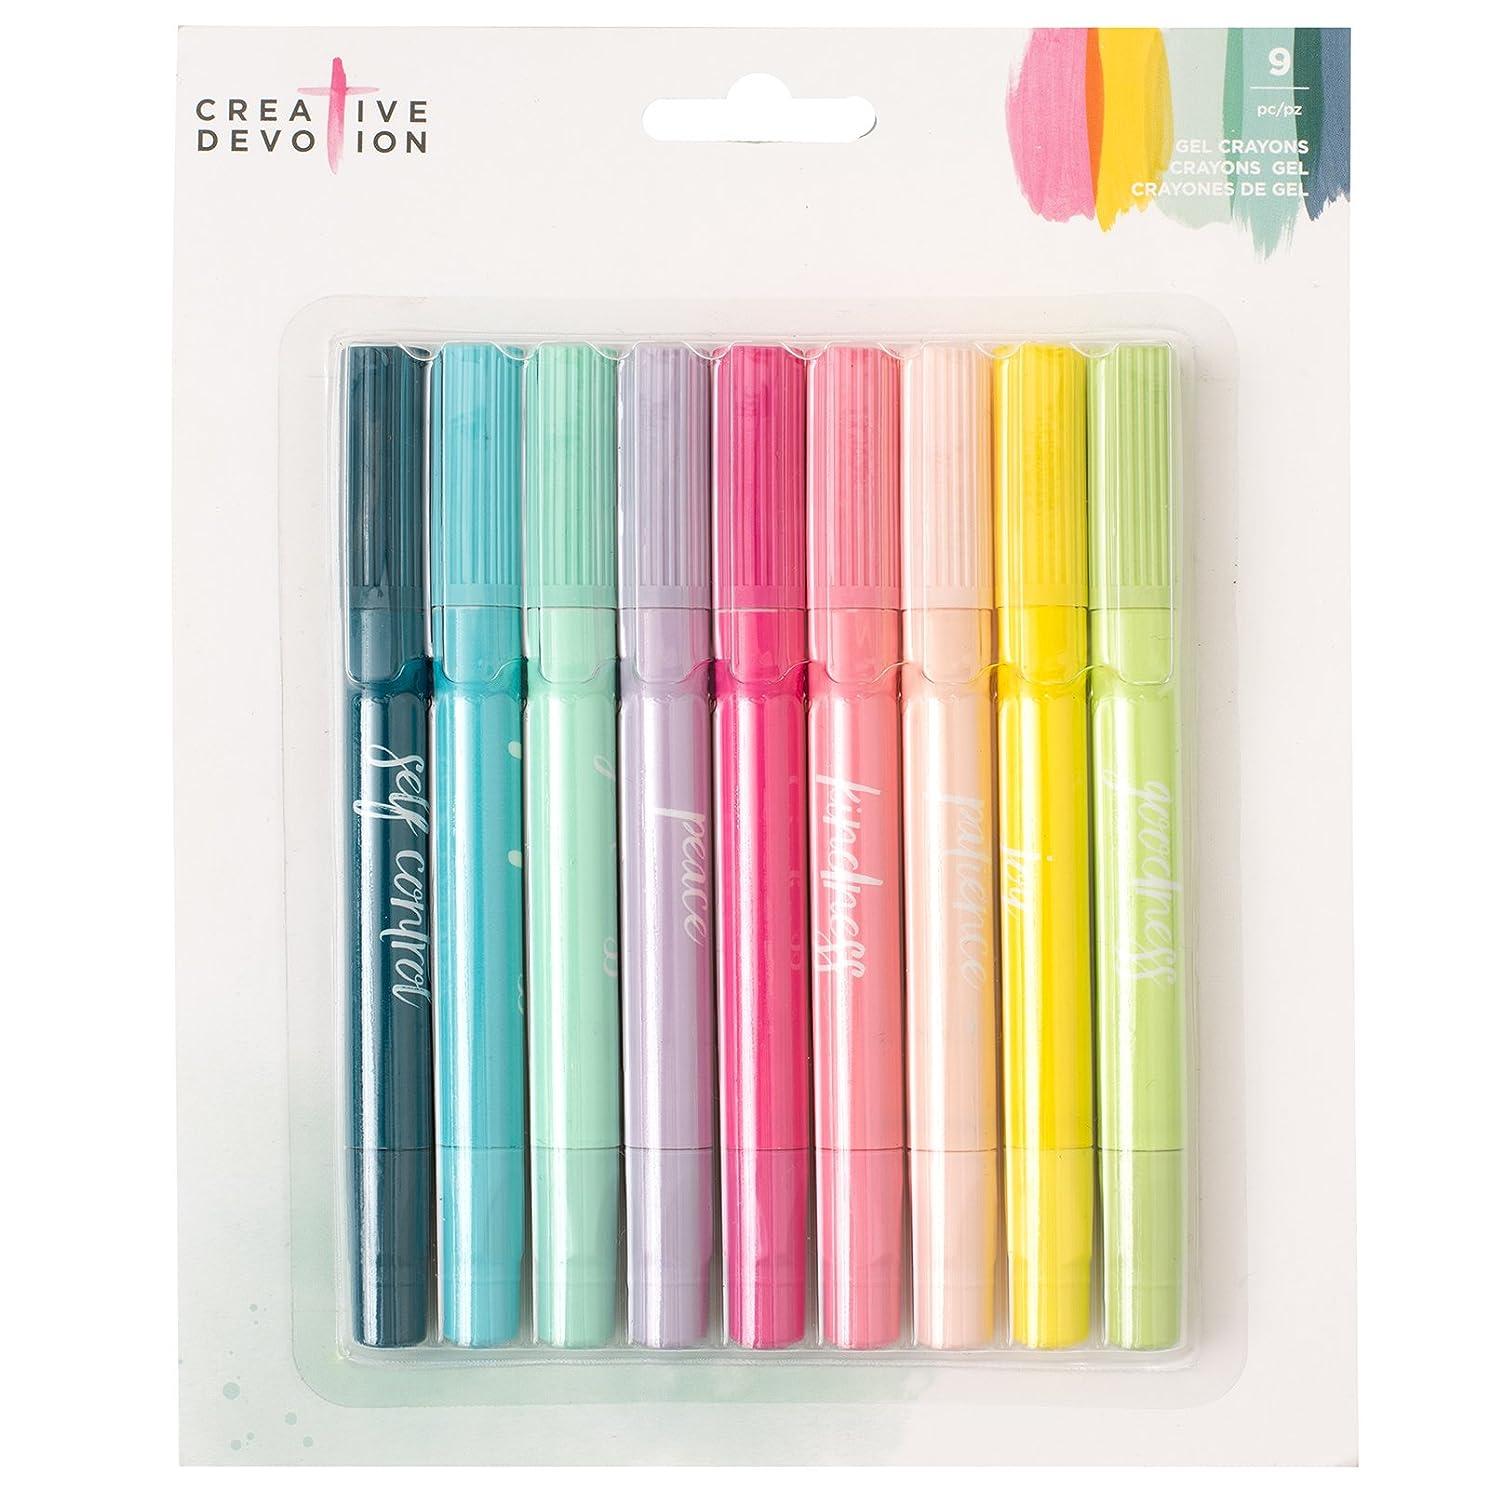 American Crafts 9 Piece Gel Crayons Creative Devotion